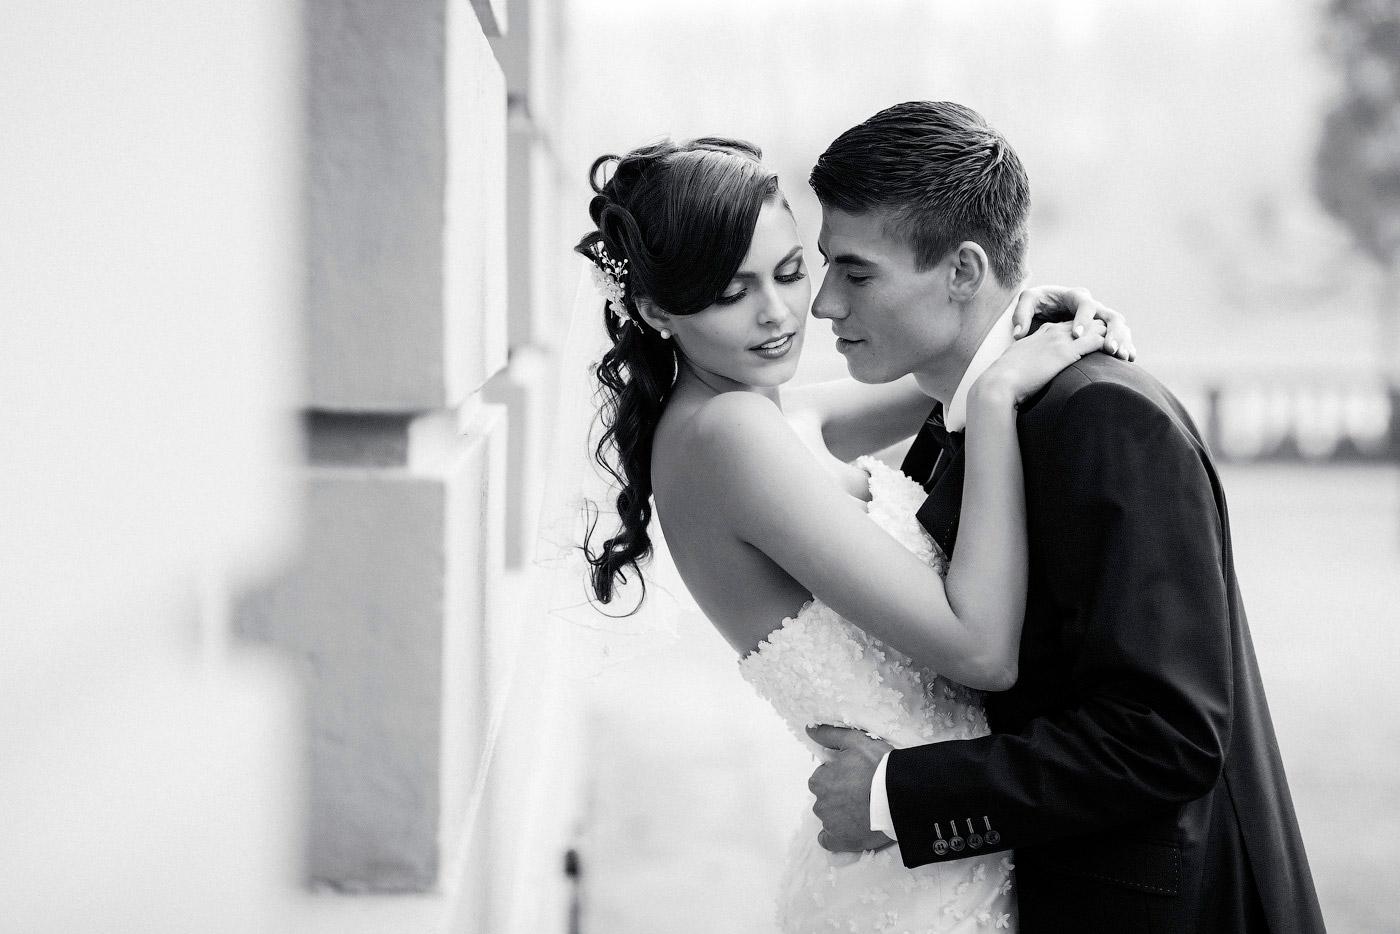 christina-eduard-wedding-photography_002